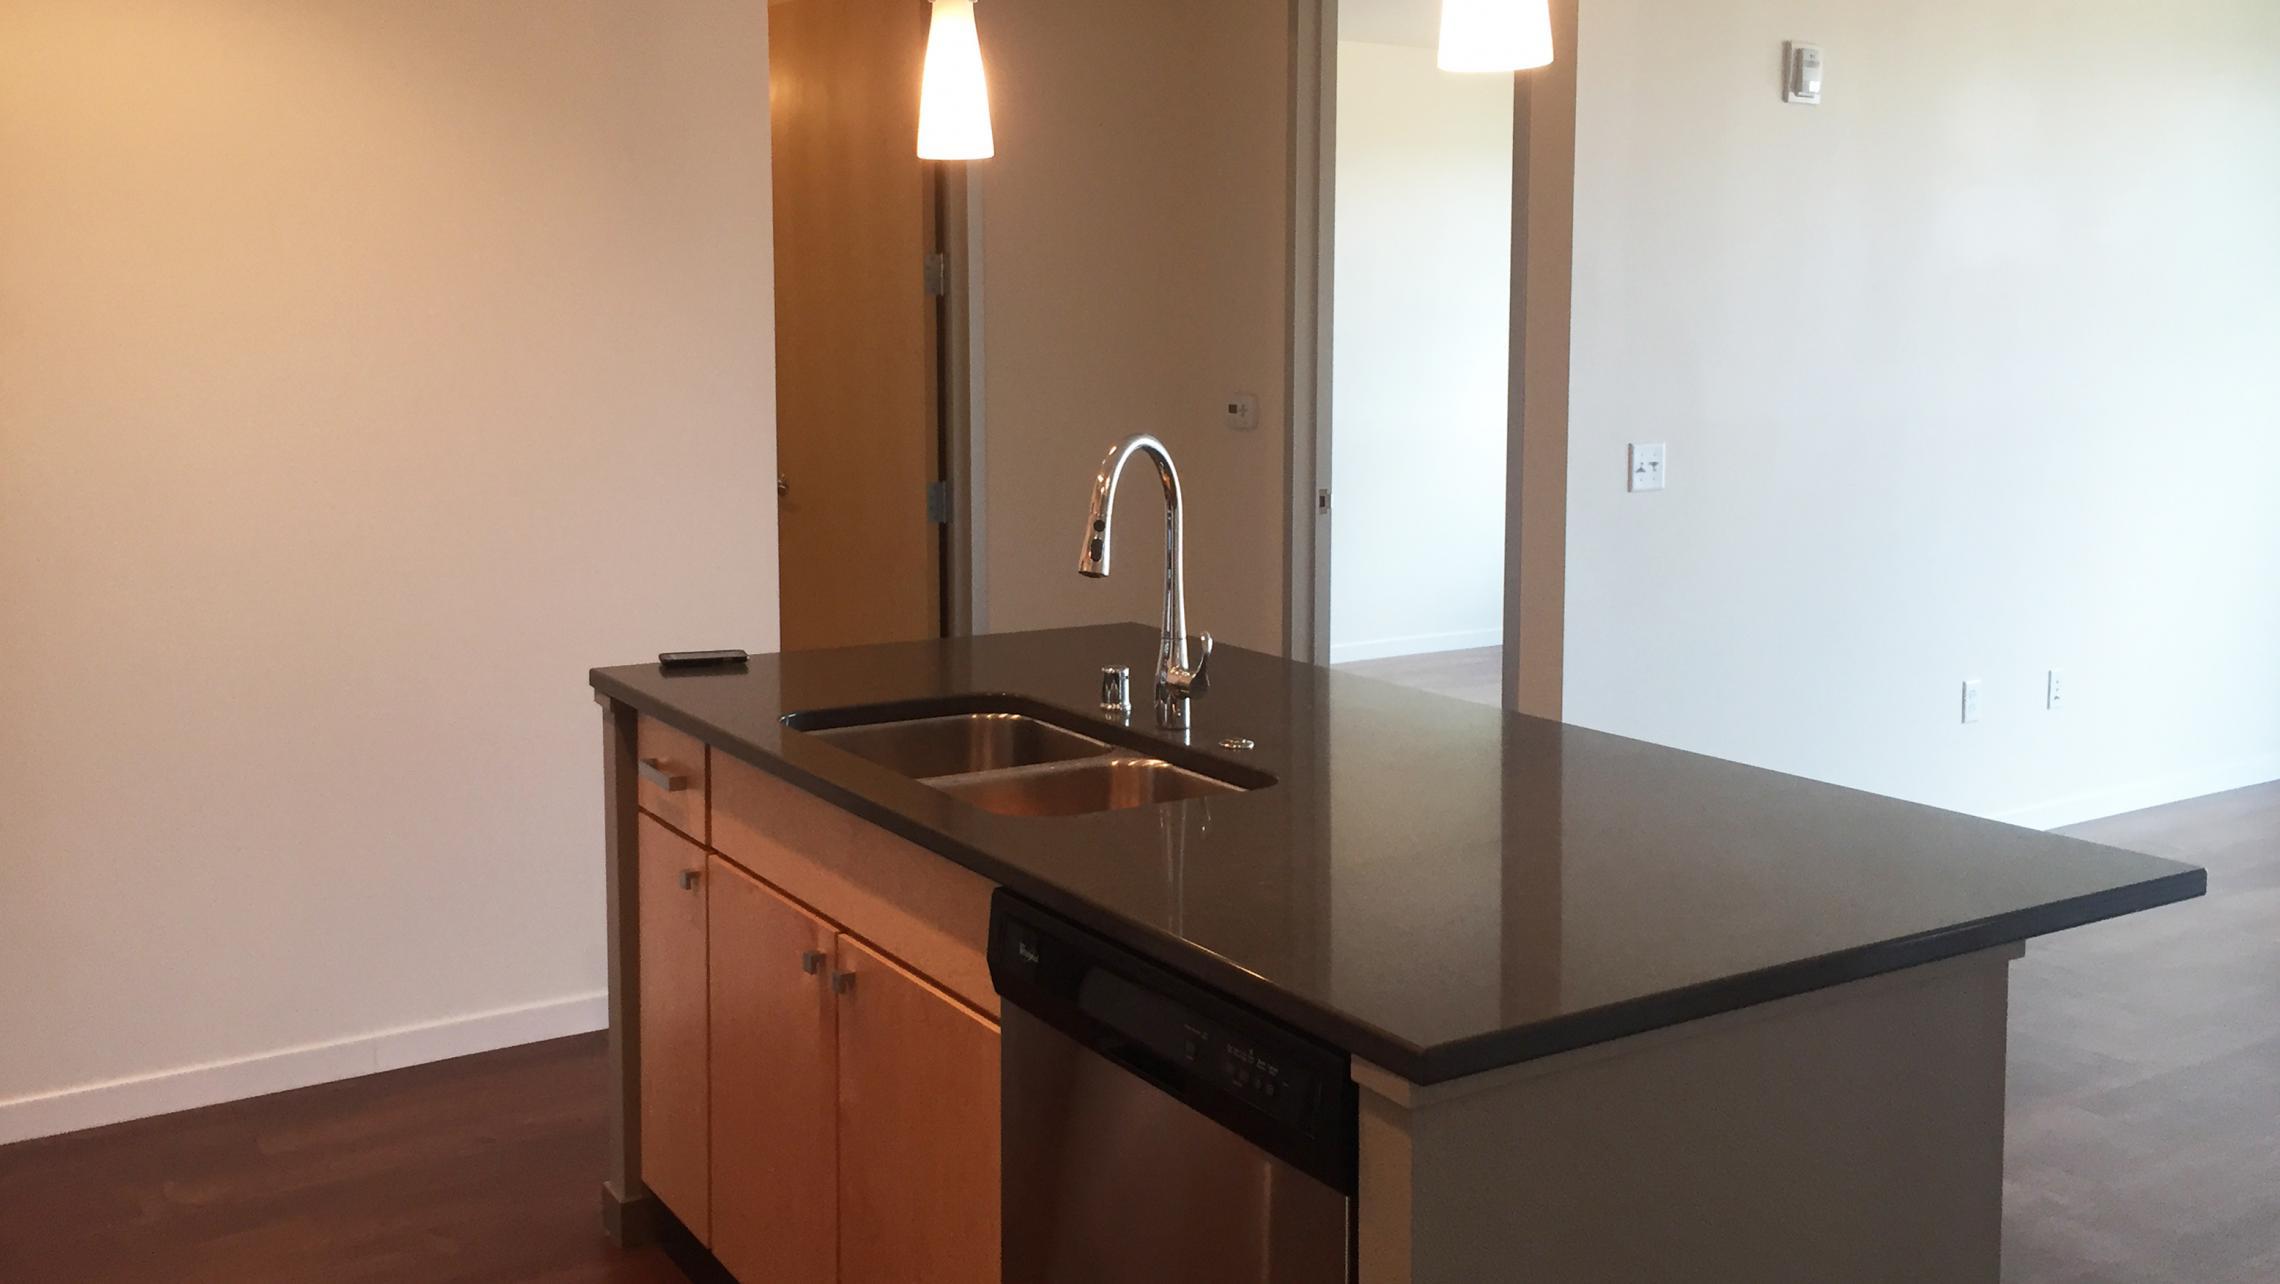 ULI Nine Line Apartment 219 - Kitchen Island